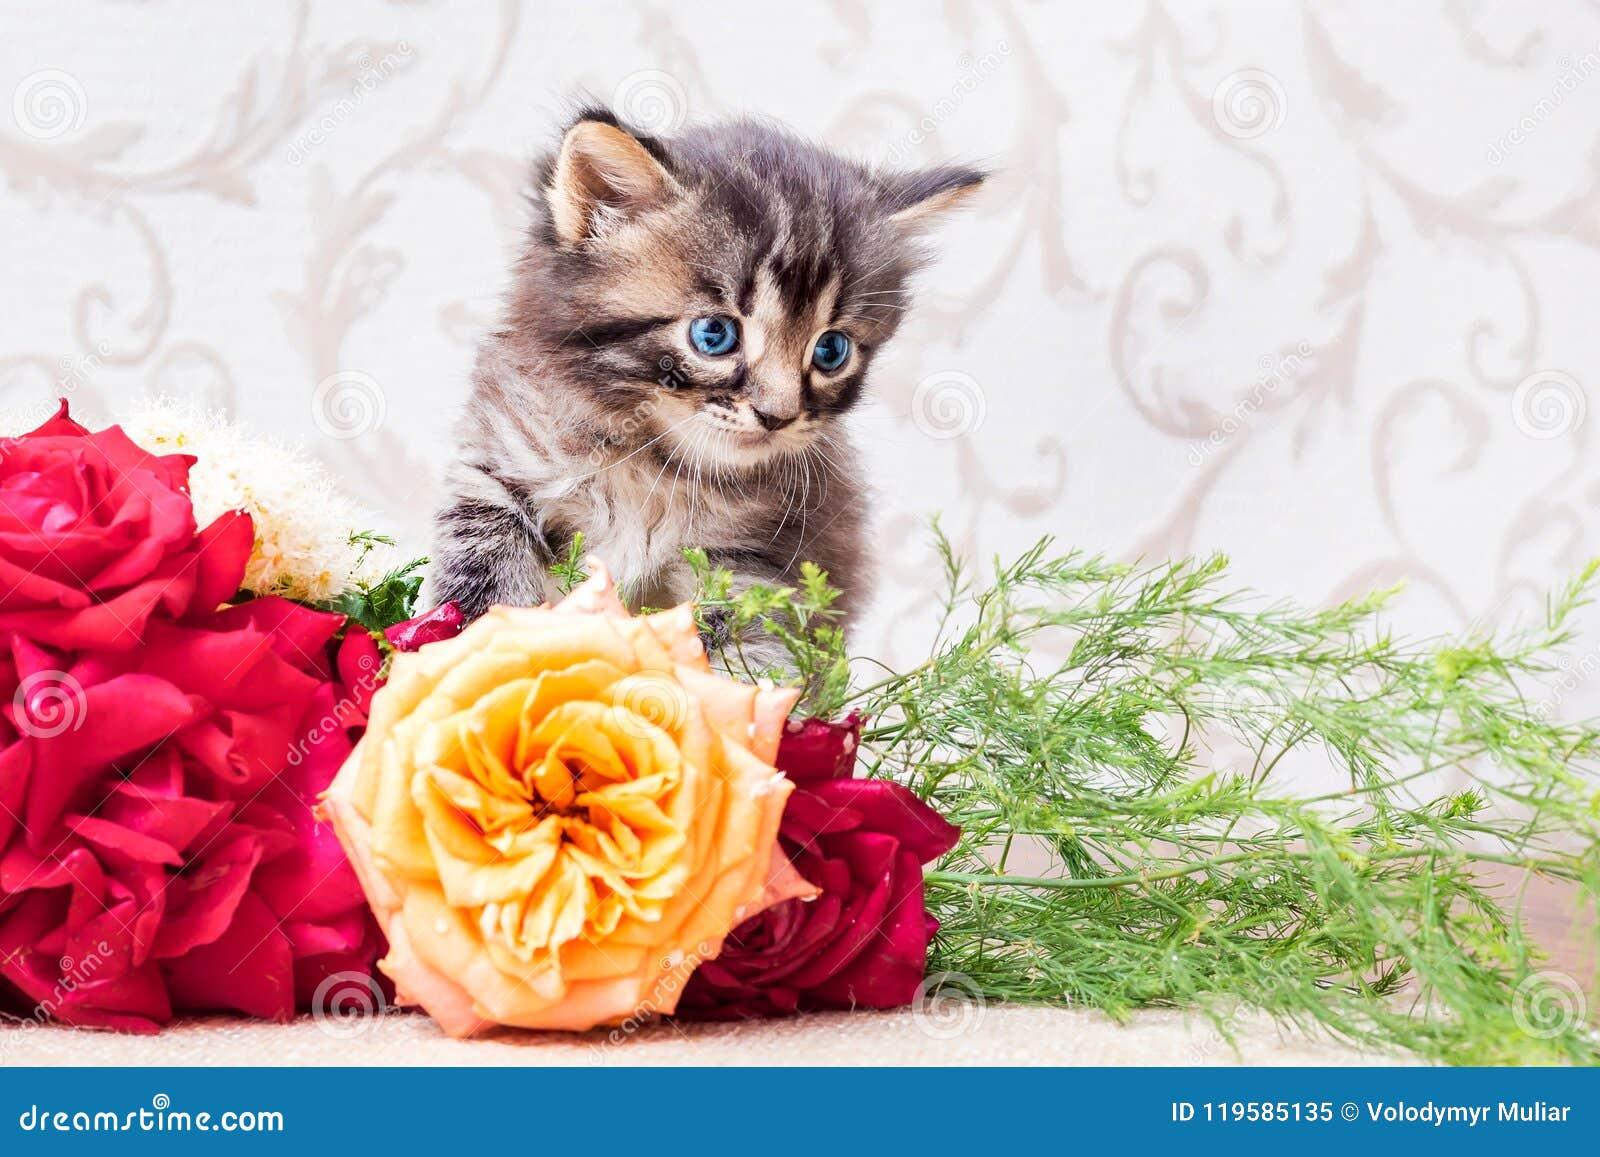 Little Striped Kitten With A Bouquet Of Flowers. Congratulations ...